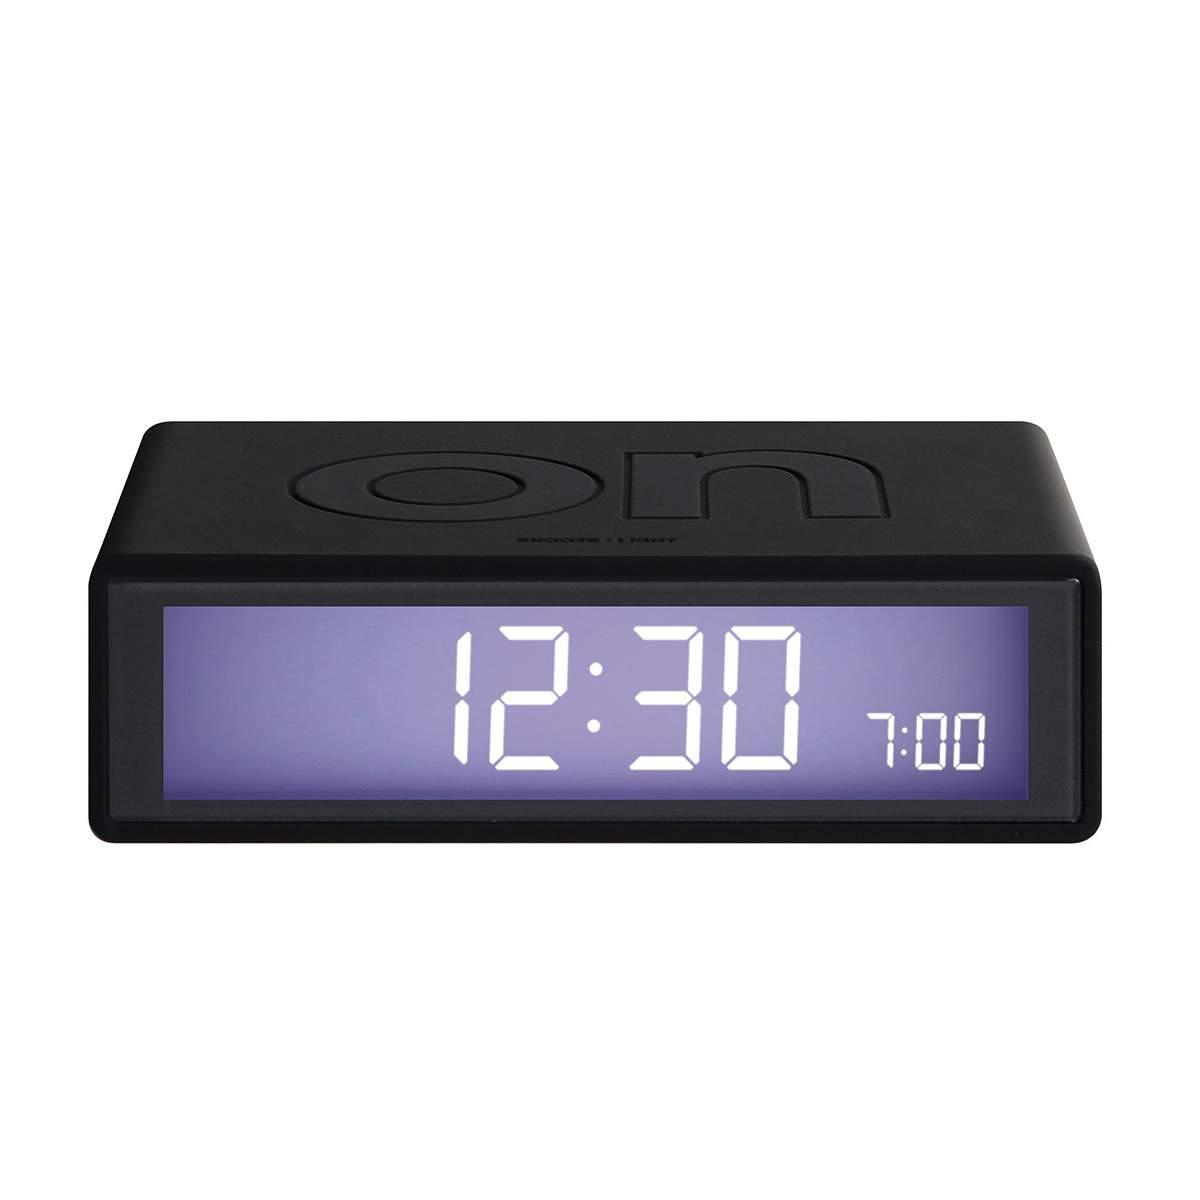 LEXON Flip LCD alarm clock LR130 black | The Design Gift Shop